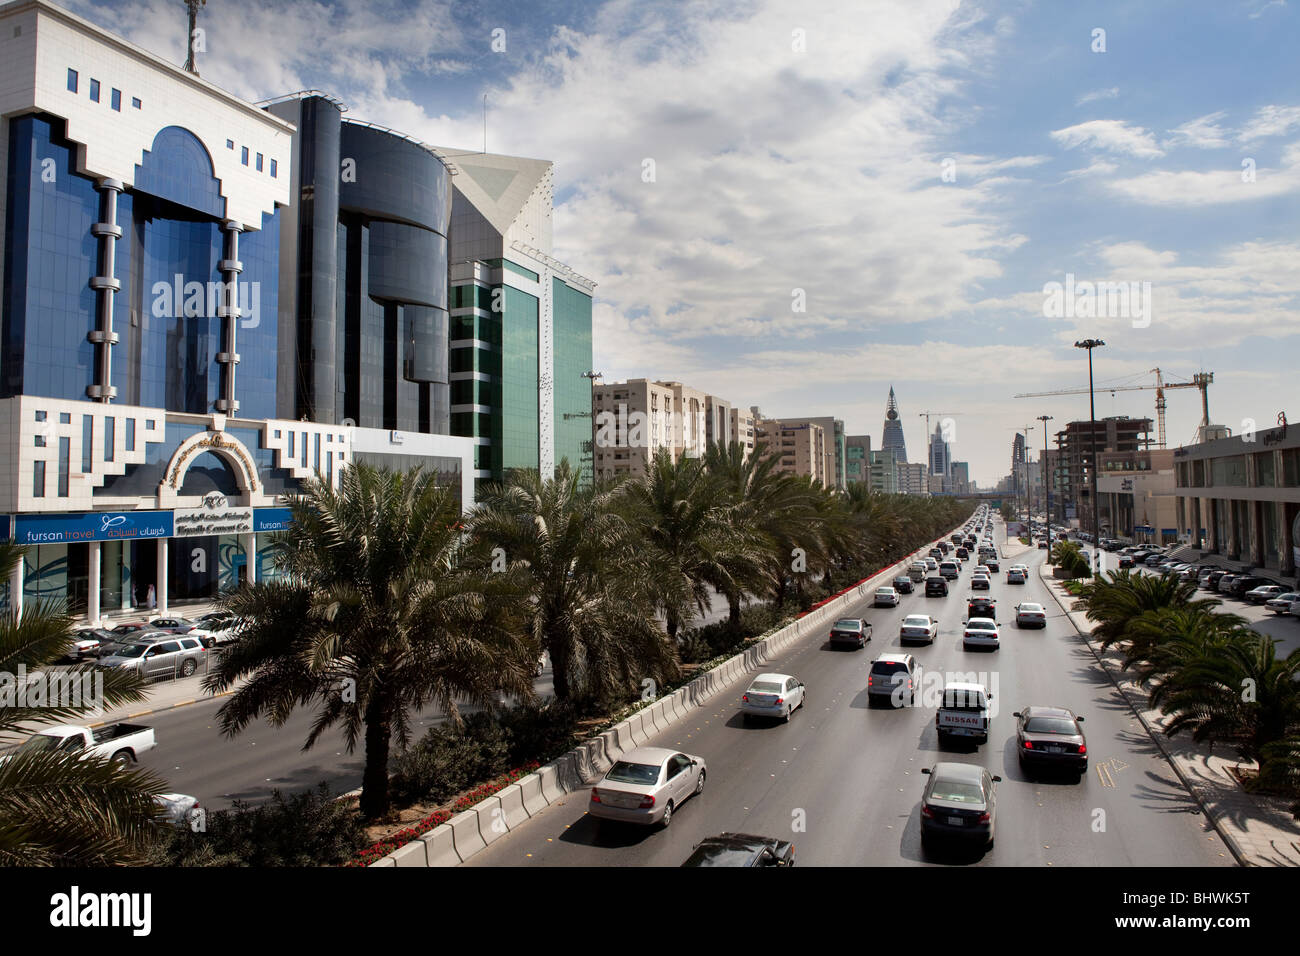 La circulation sur rue passante Riyadh Arabie Saoudite Photo Stock